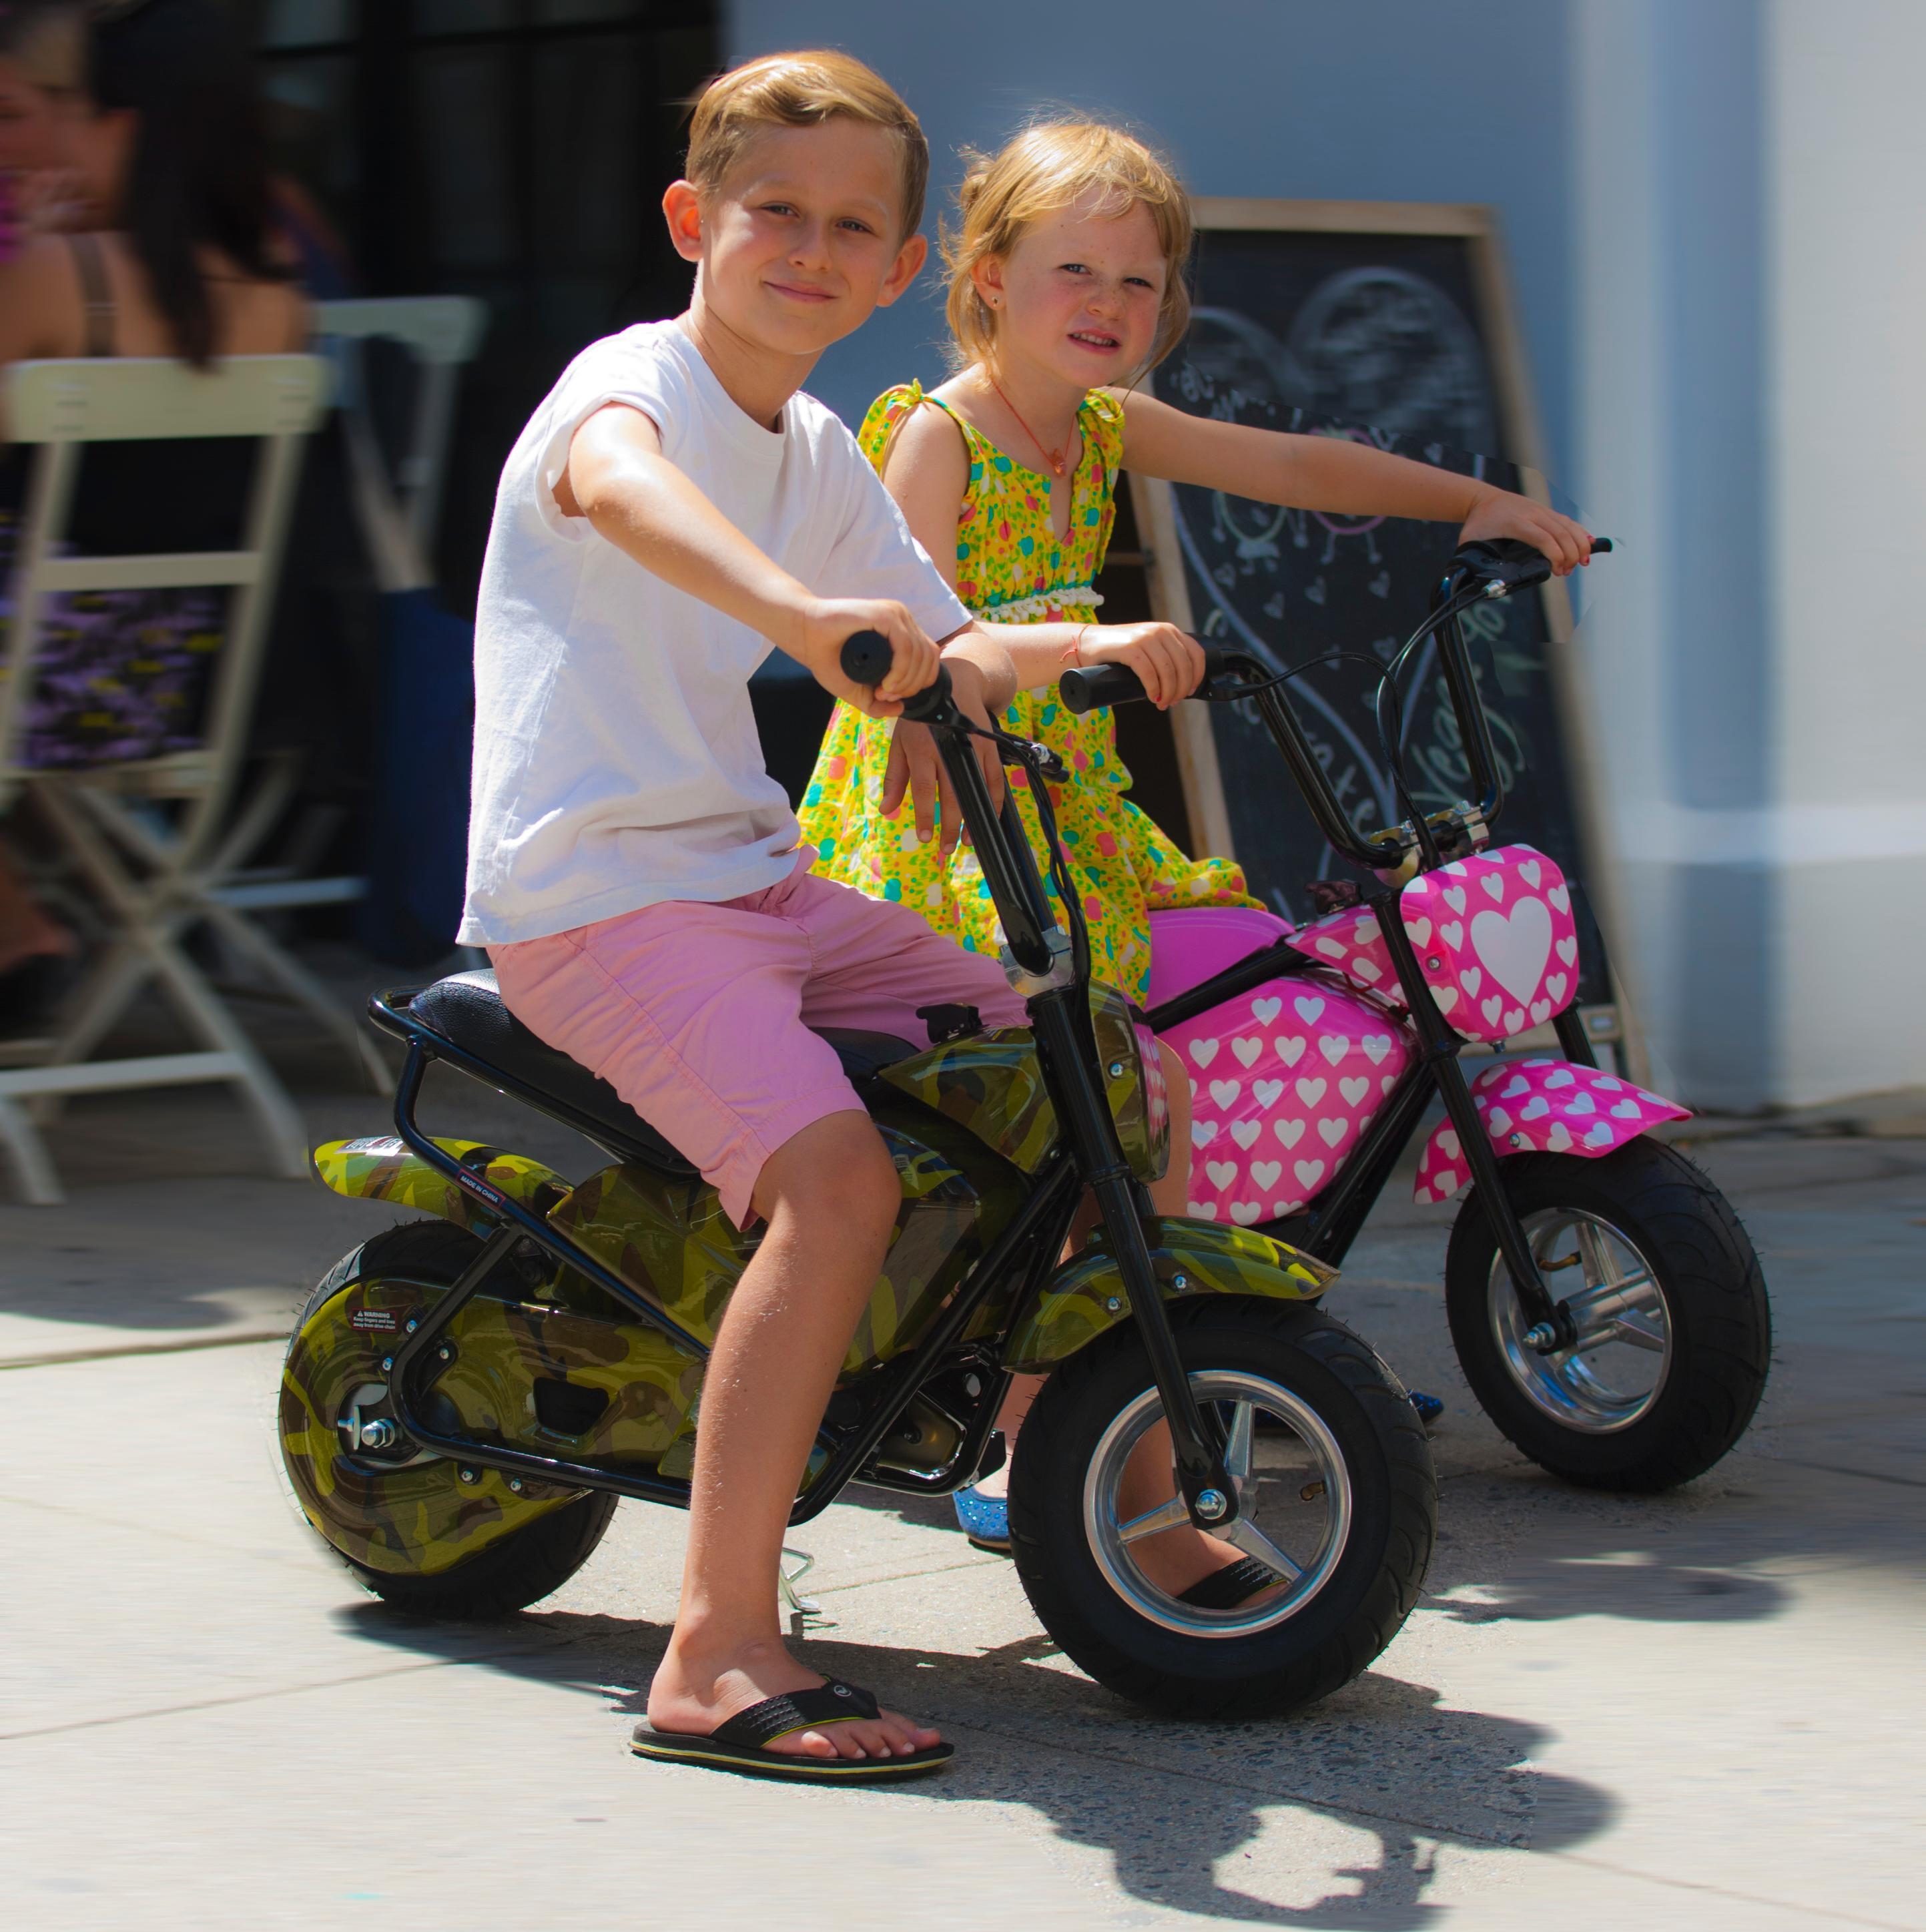 Amazon.com : Jetson Electric Bikes Junior Kids E-Bike, Pink, 15-Inch